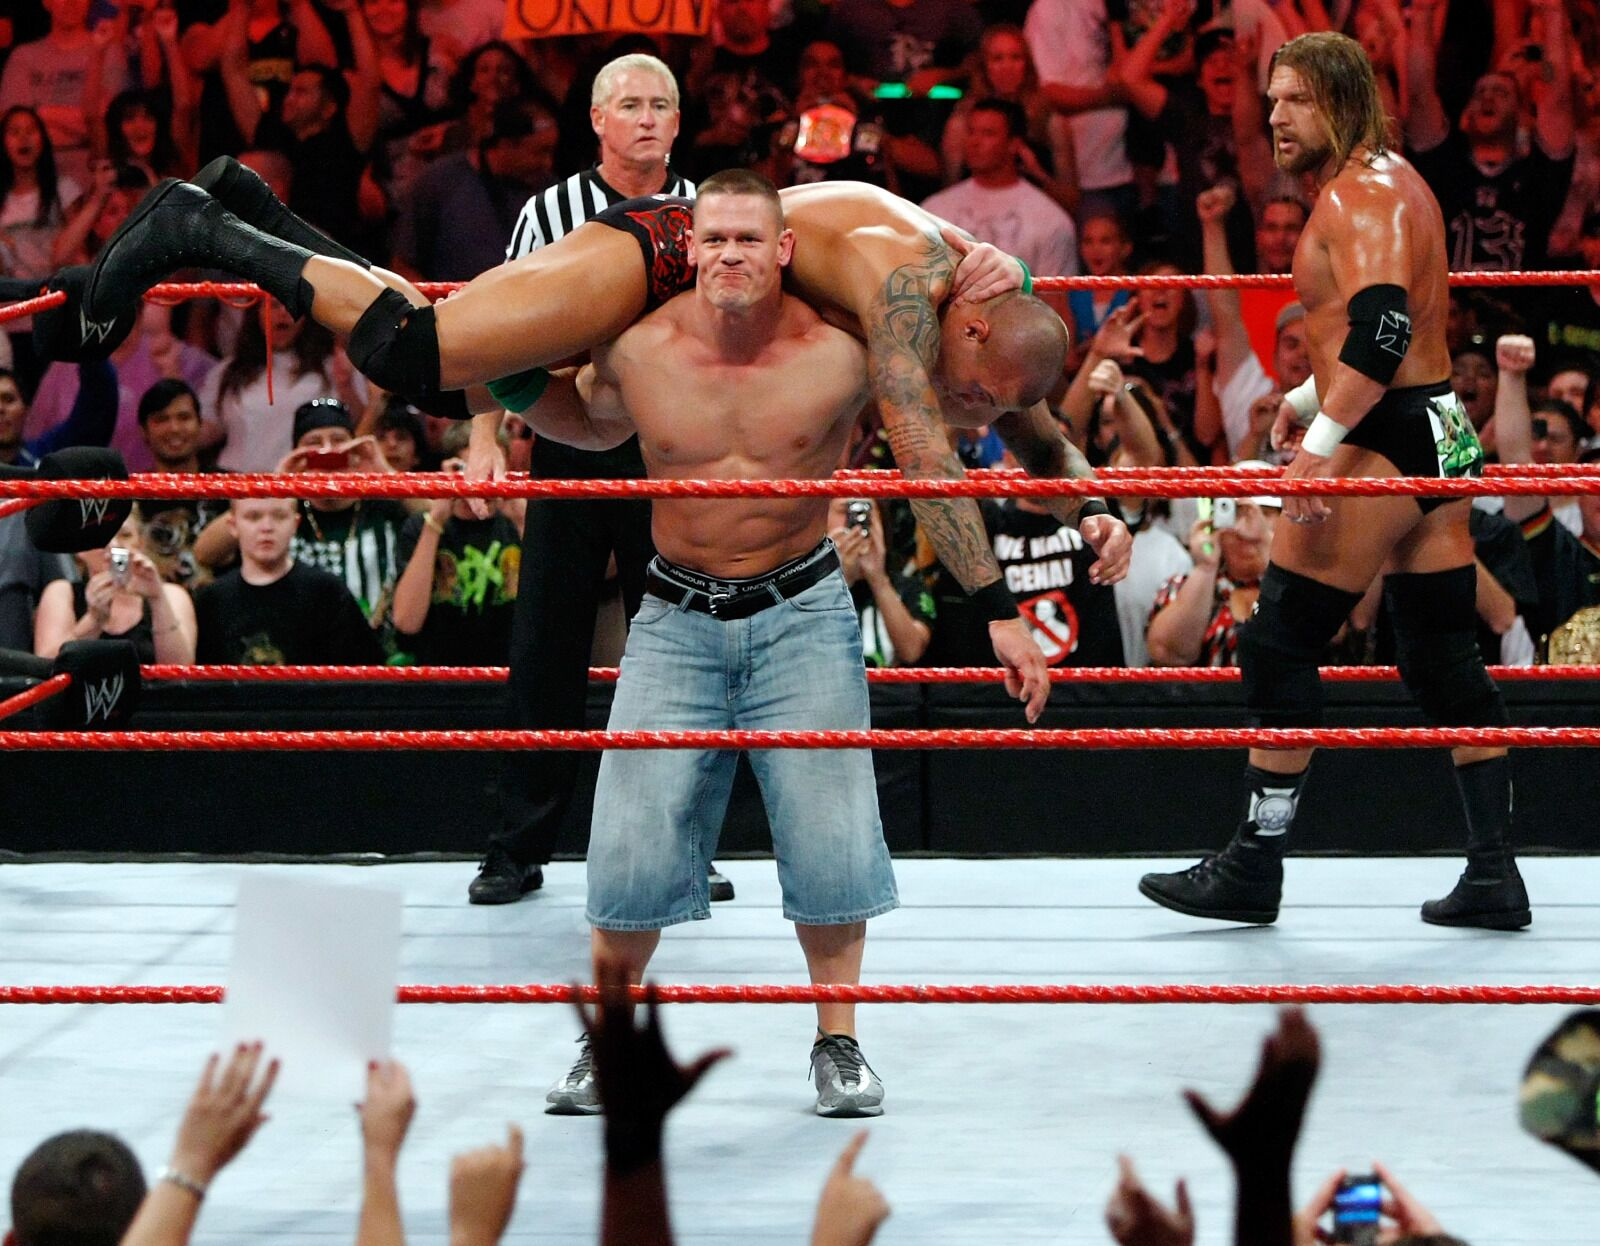 John Cena is teasing a WWE Royal Rumble 2020 return